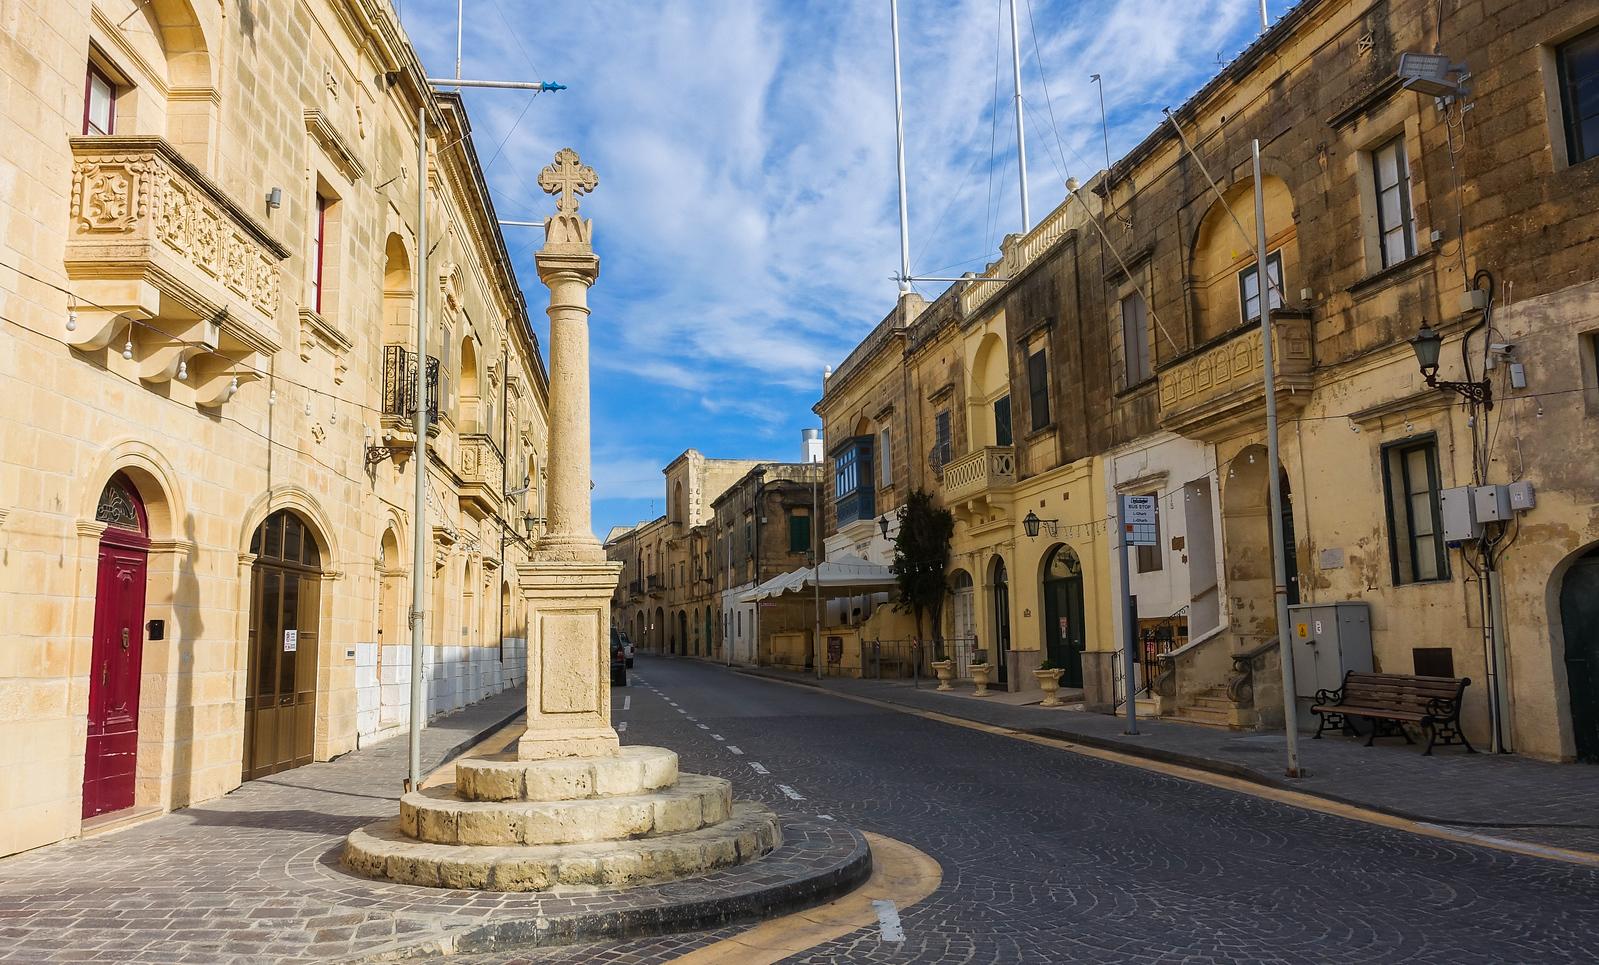 Malta Pictures - Gharb Village